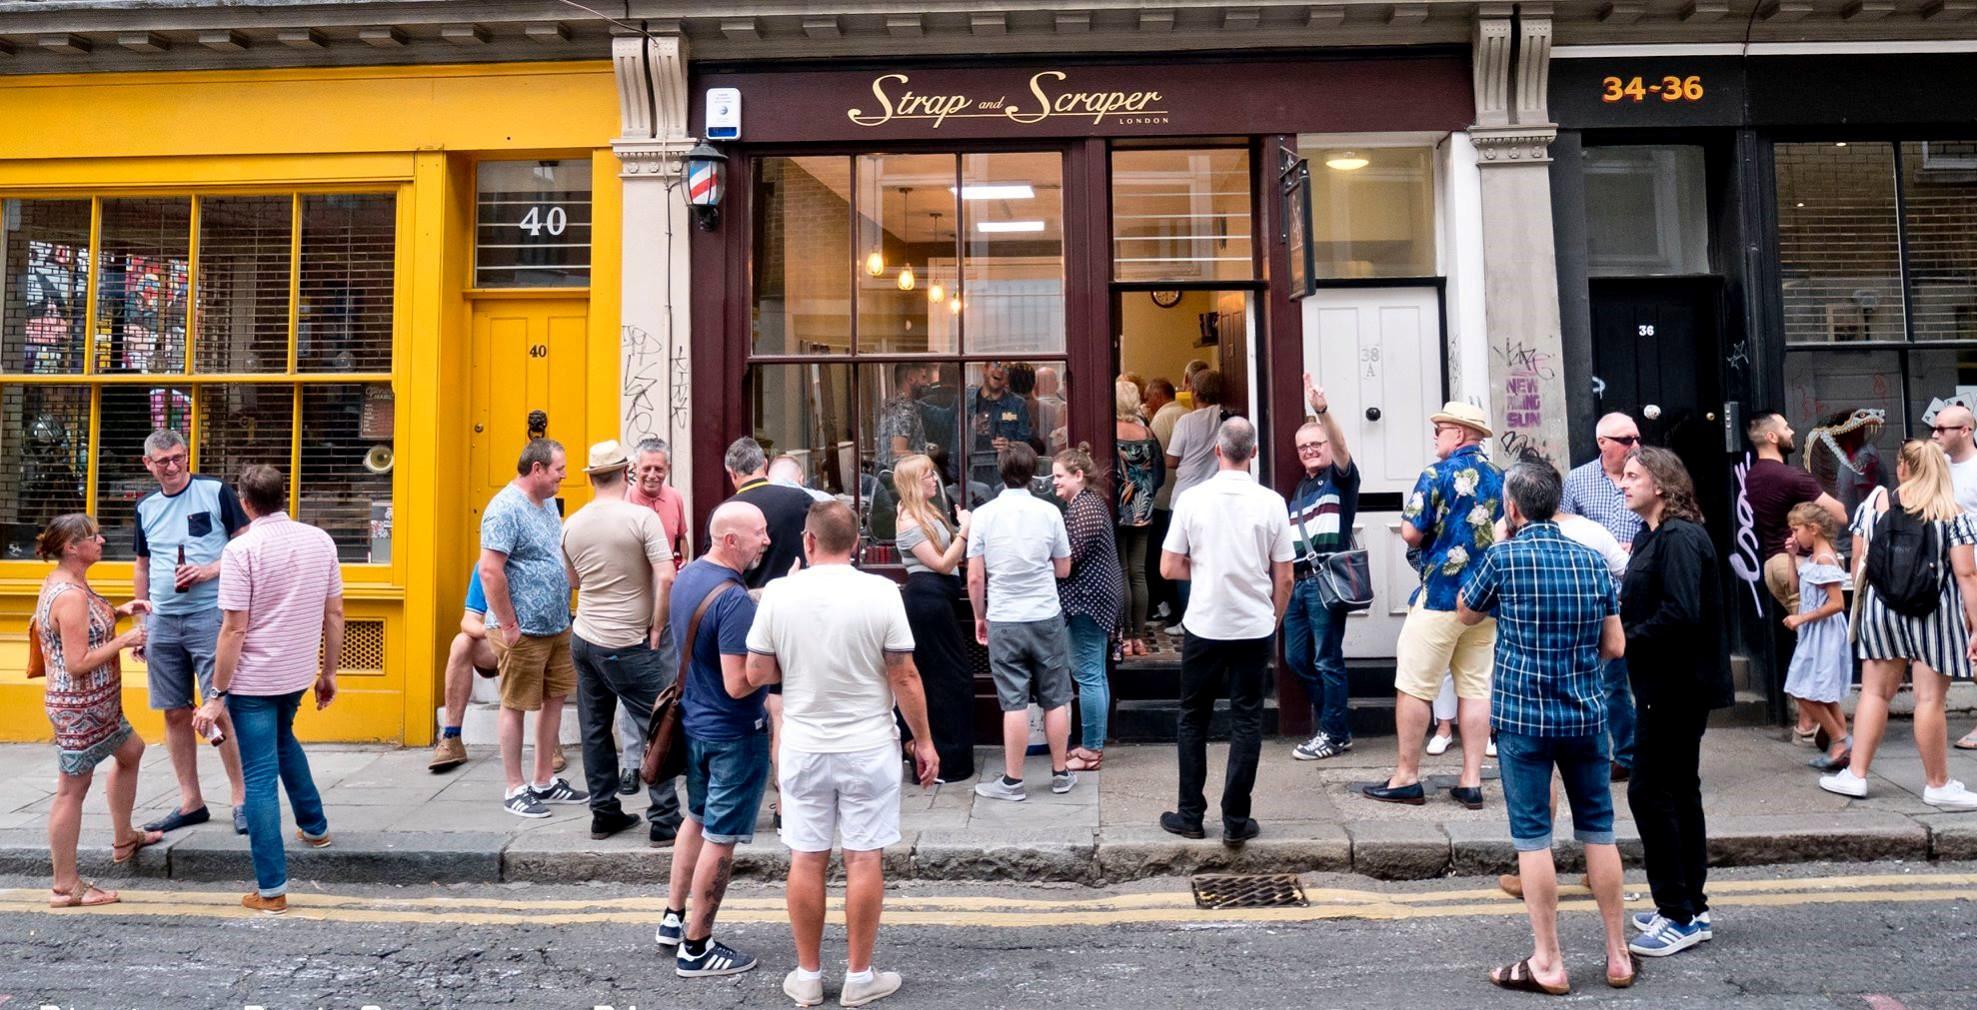 london barbershop, barbers near me, shoreditch barbers, shoreditch, shoreditch barber shop